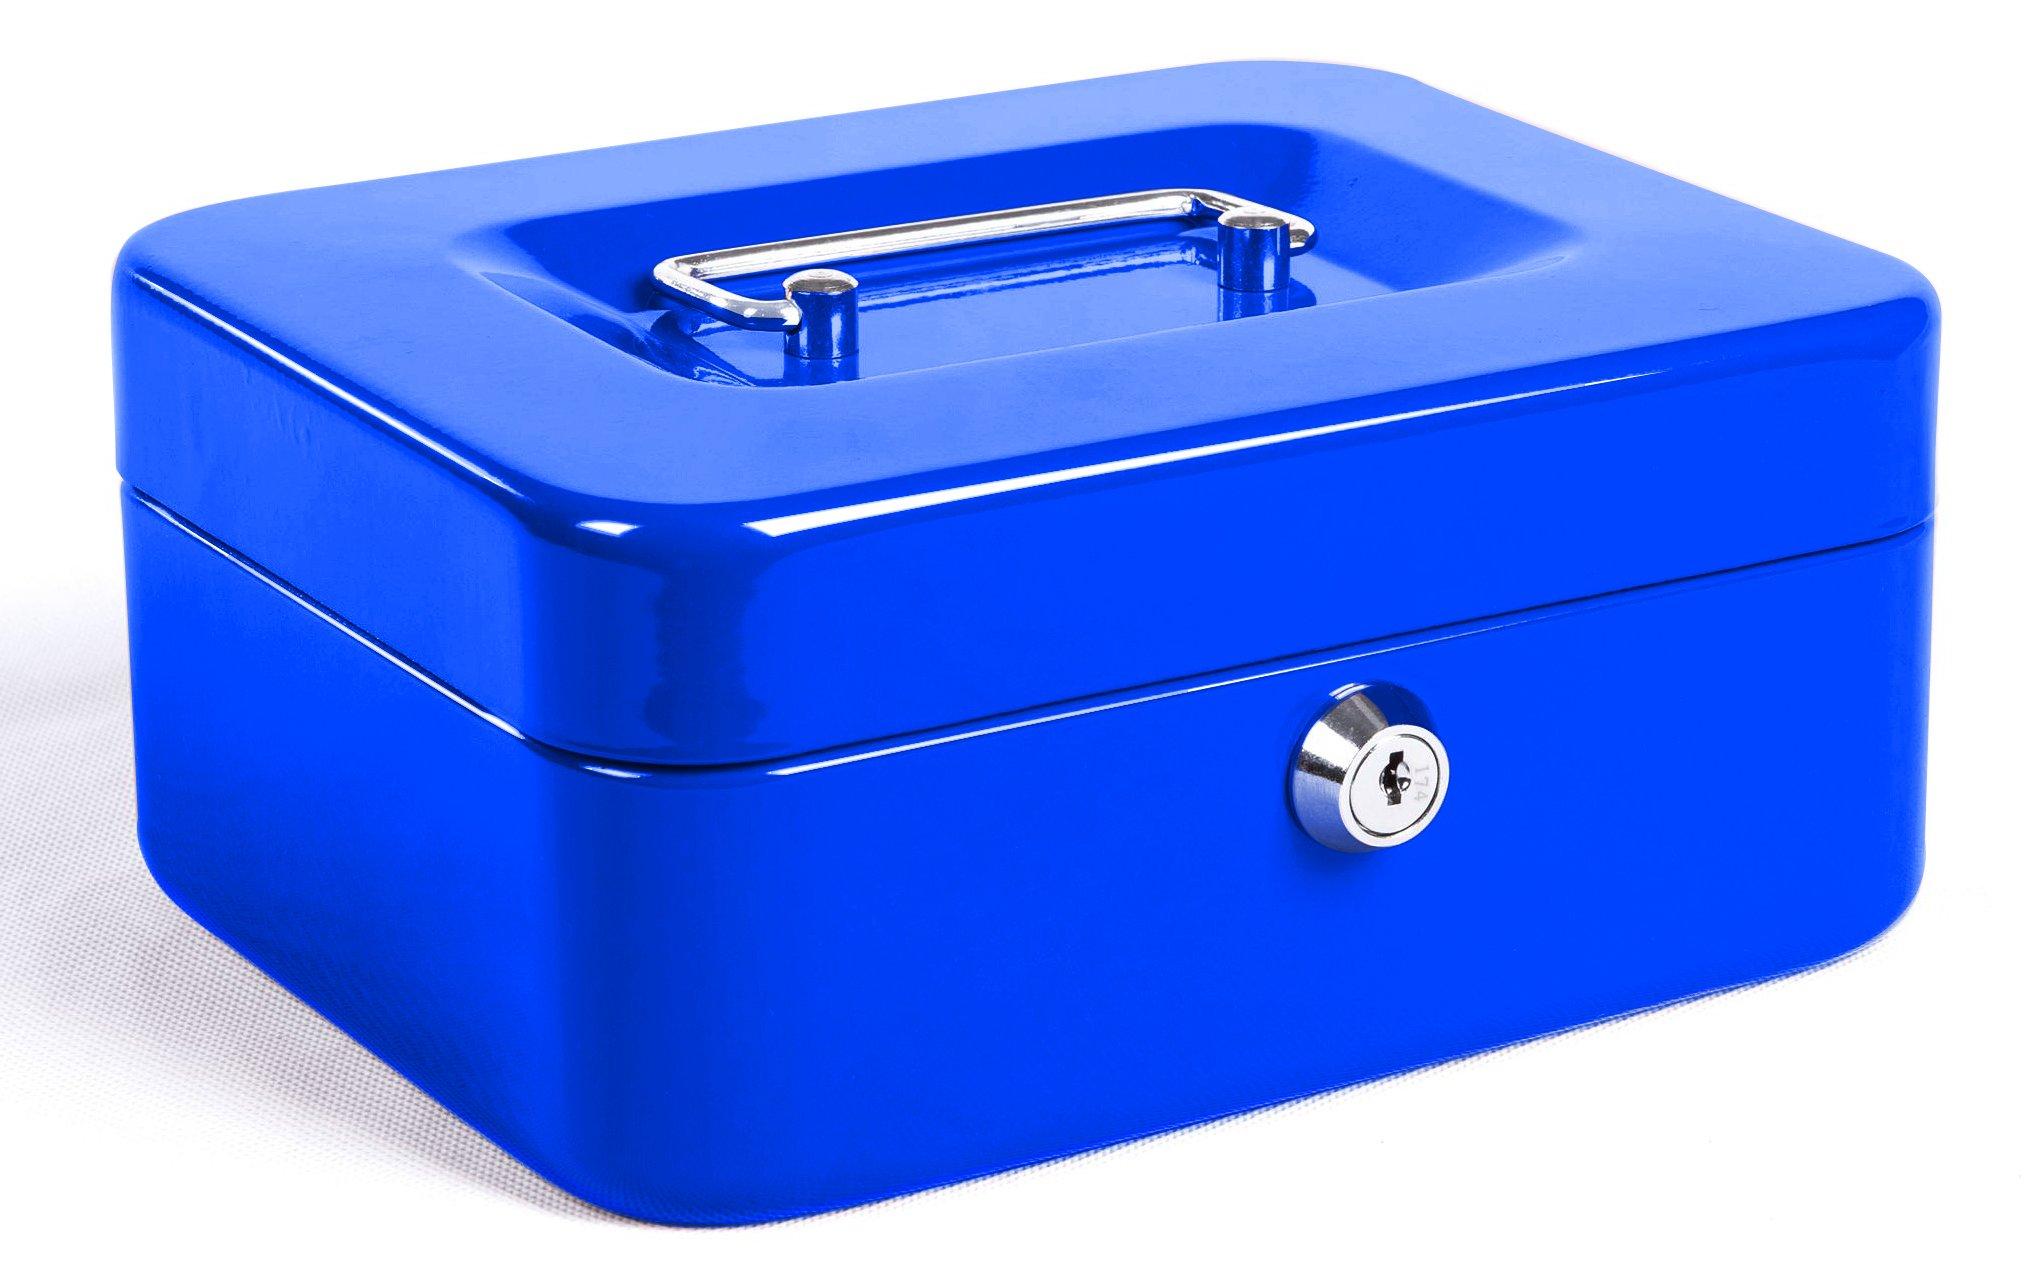 323fab27ae65 Jssmst Locking Small Steel Cash Box with Money Tray,Lock Box,Blue